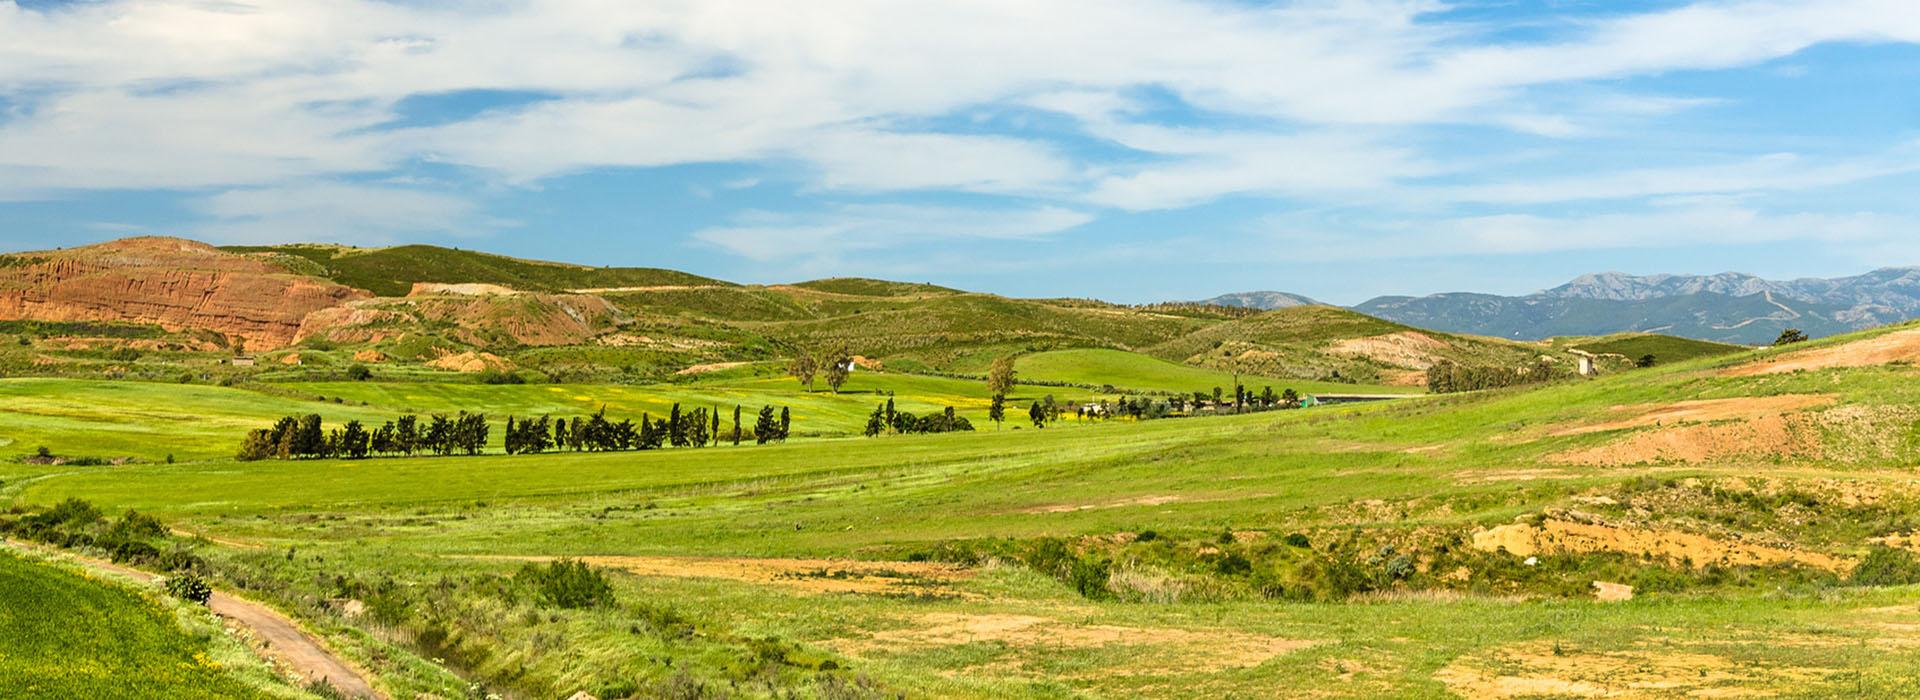 Sardegna, campagna vicino a Ussana